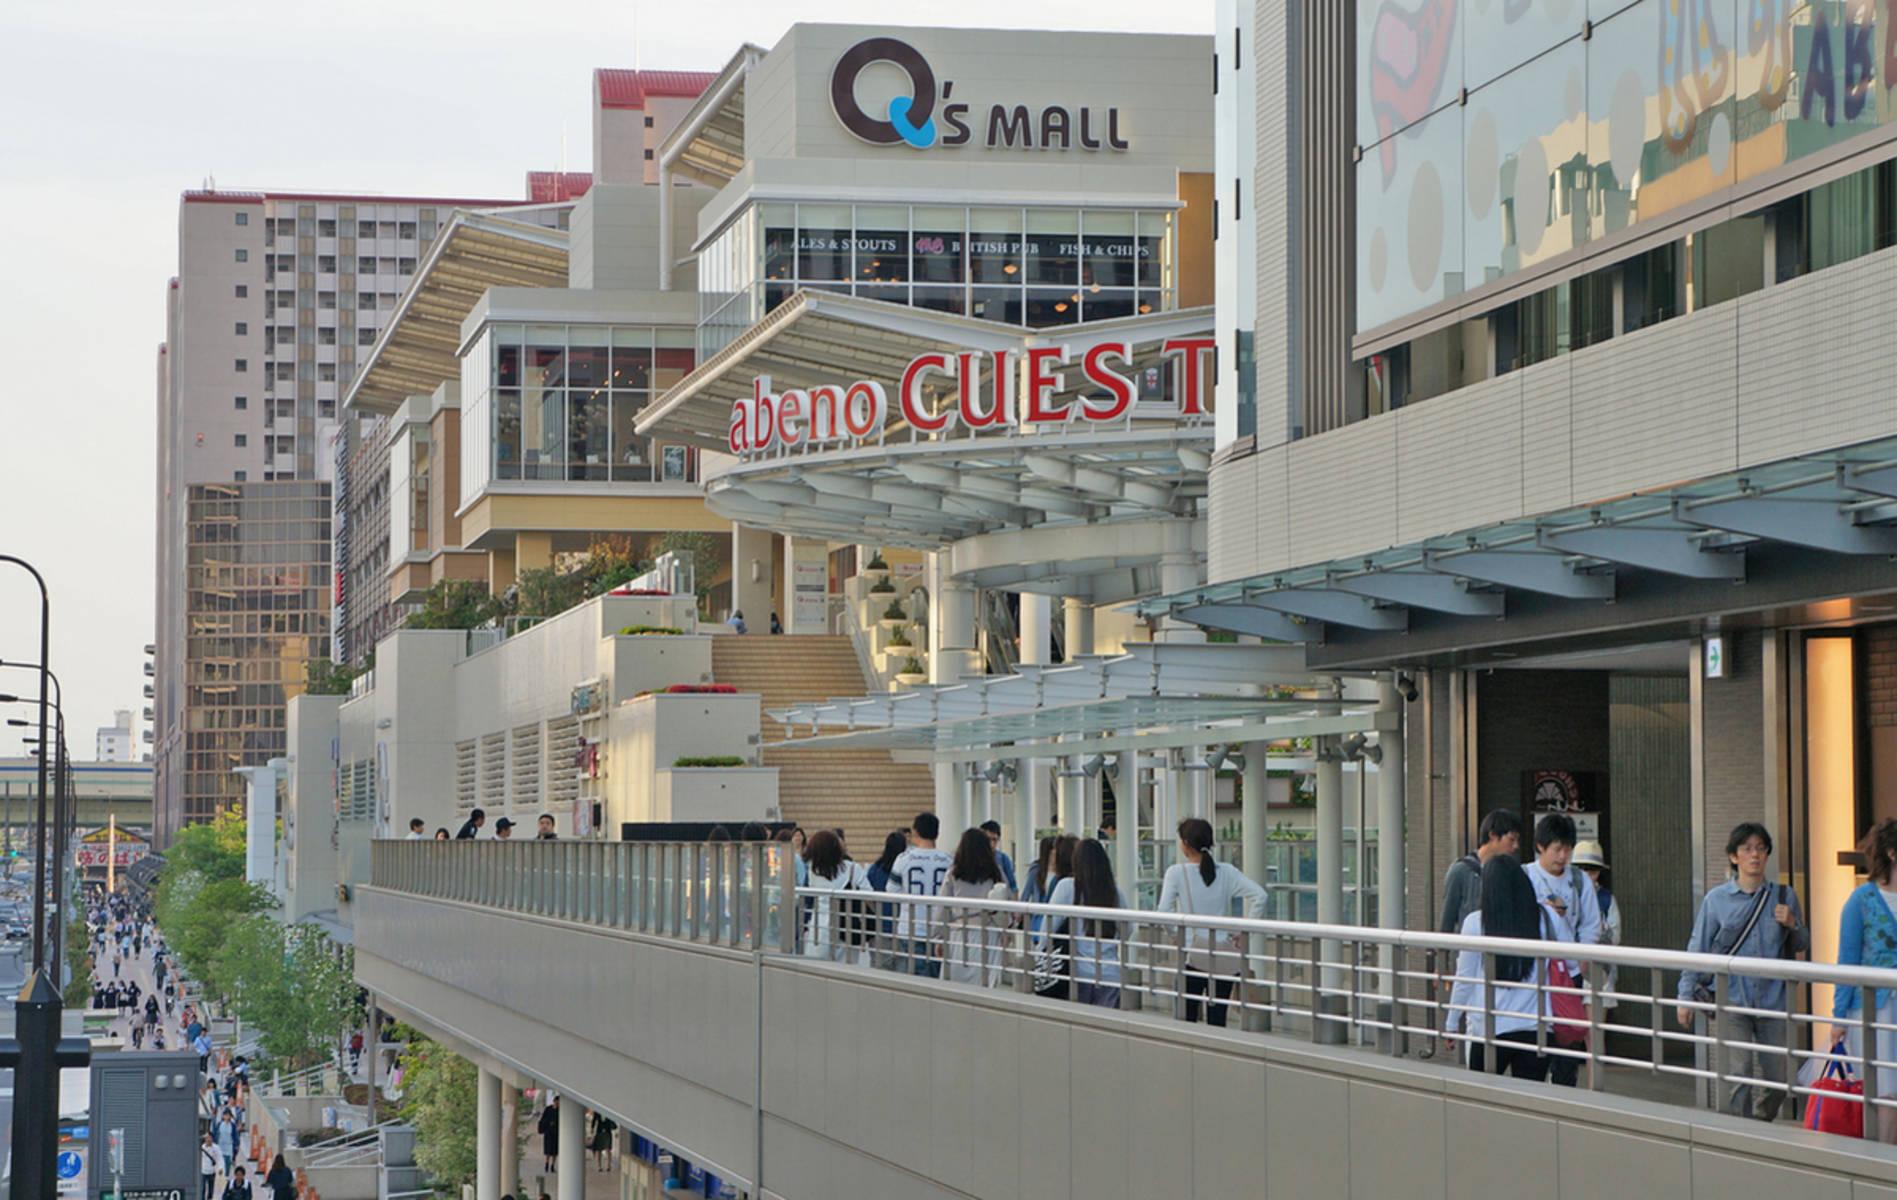 Abeno Q Mall